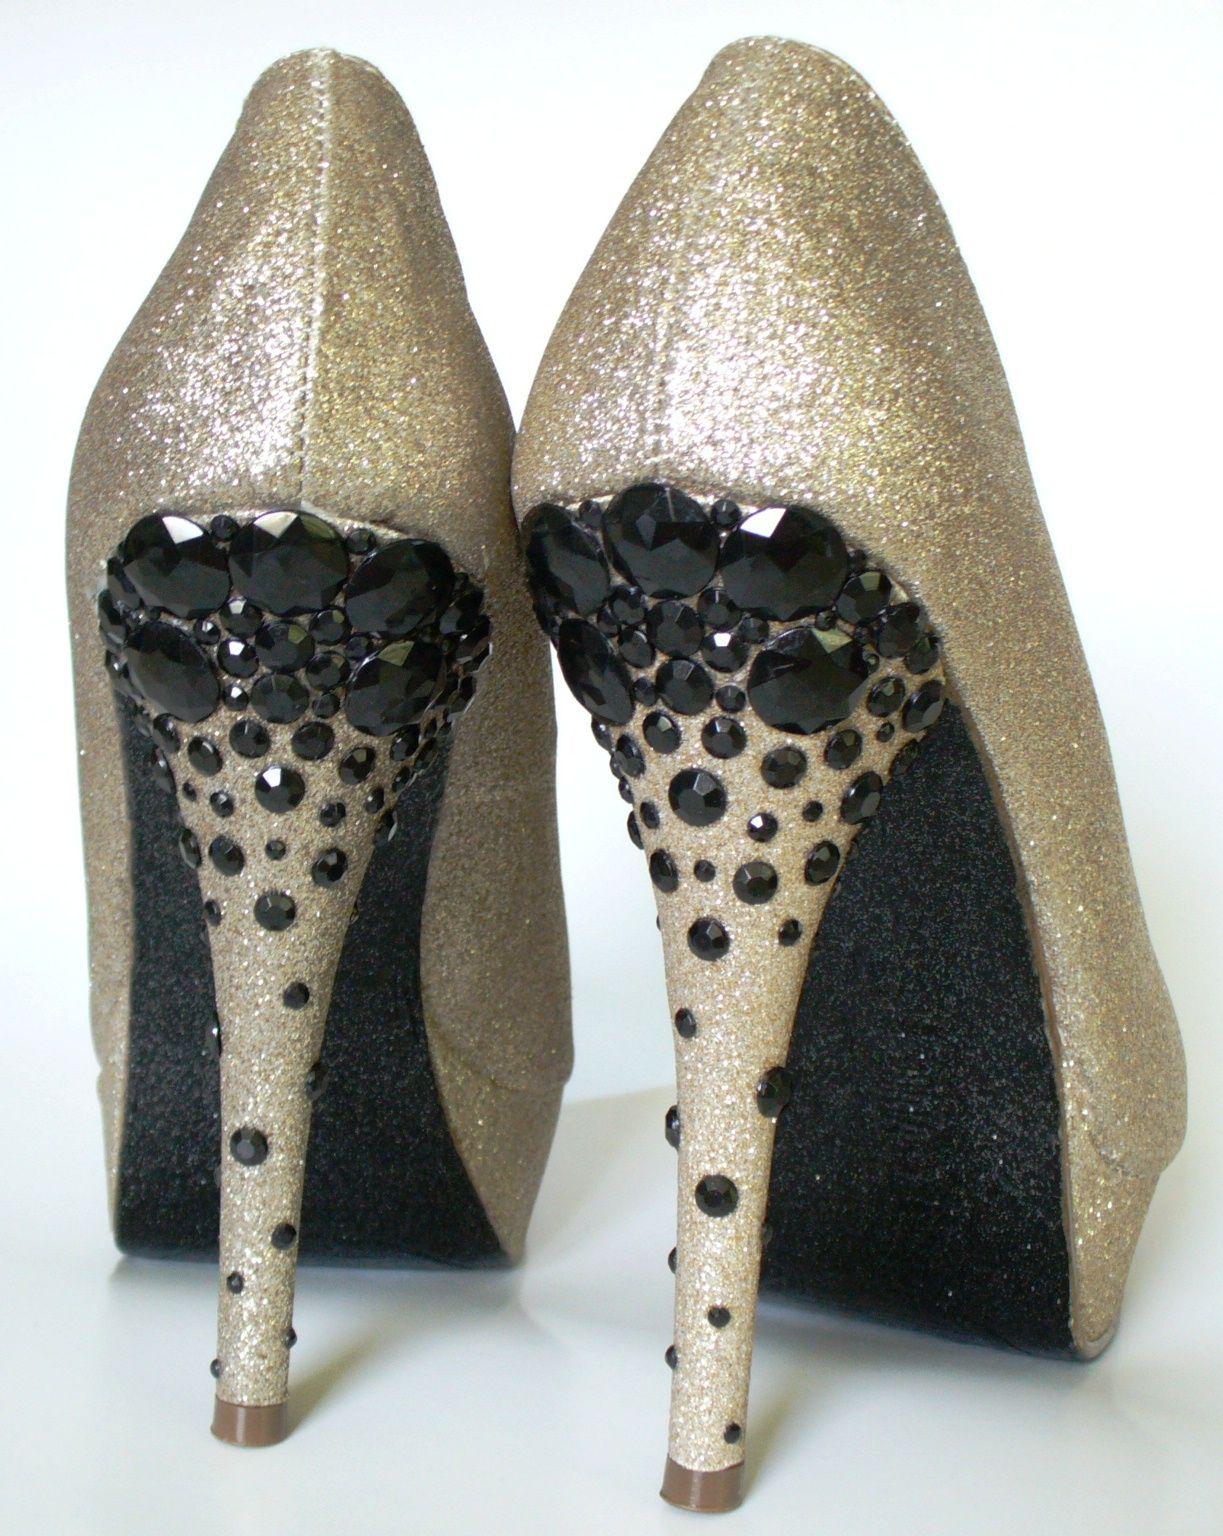 52c919e89f4e The Sparkle Queen: Custom Order: Black and Gold Rhinestone Heels Sparkle  Glitter Shoes